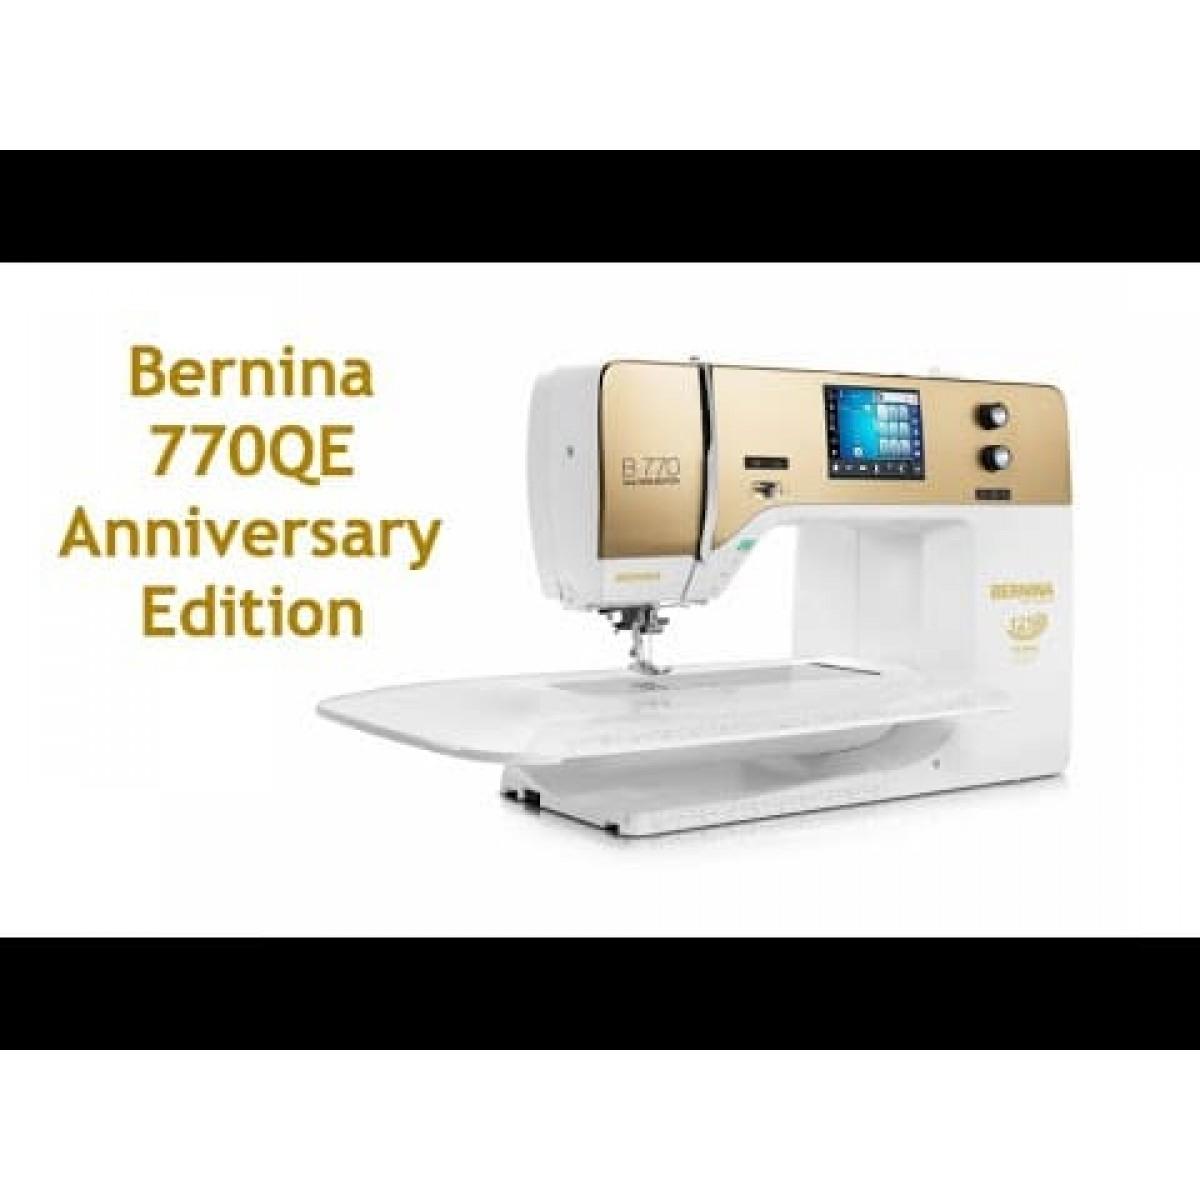 Berninа 770 QE Anniversary Edition